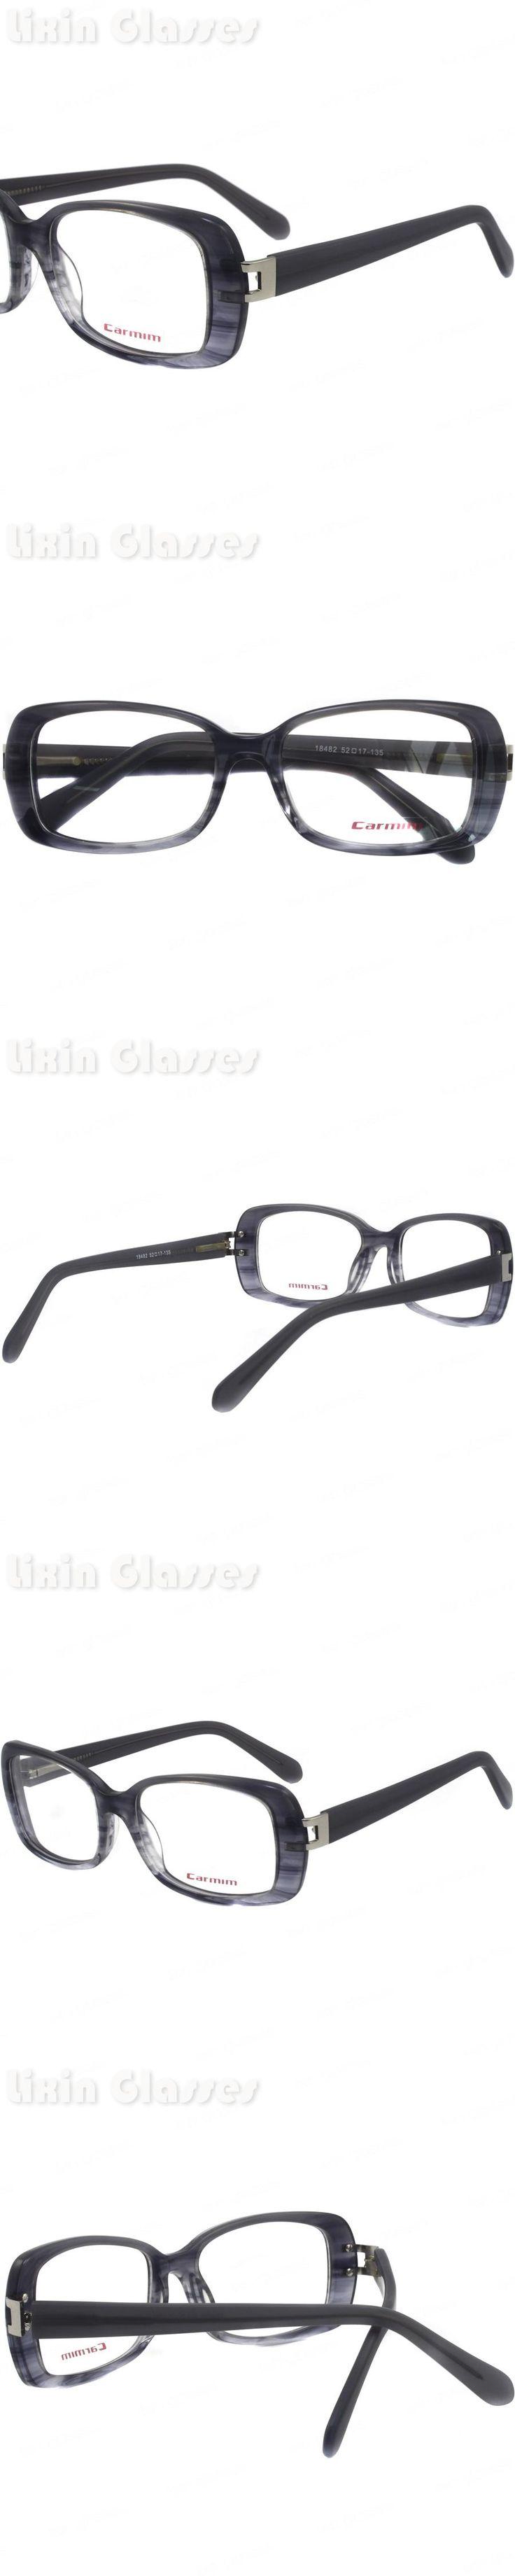 New High Quality Men Acetate Spring Hinge Demi Light Blue clean lens Glasses Frame/Eyeglasses/Optical Frame/Eyewear 18482